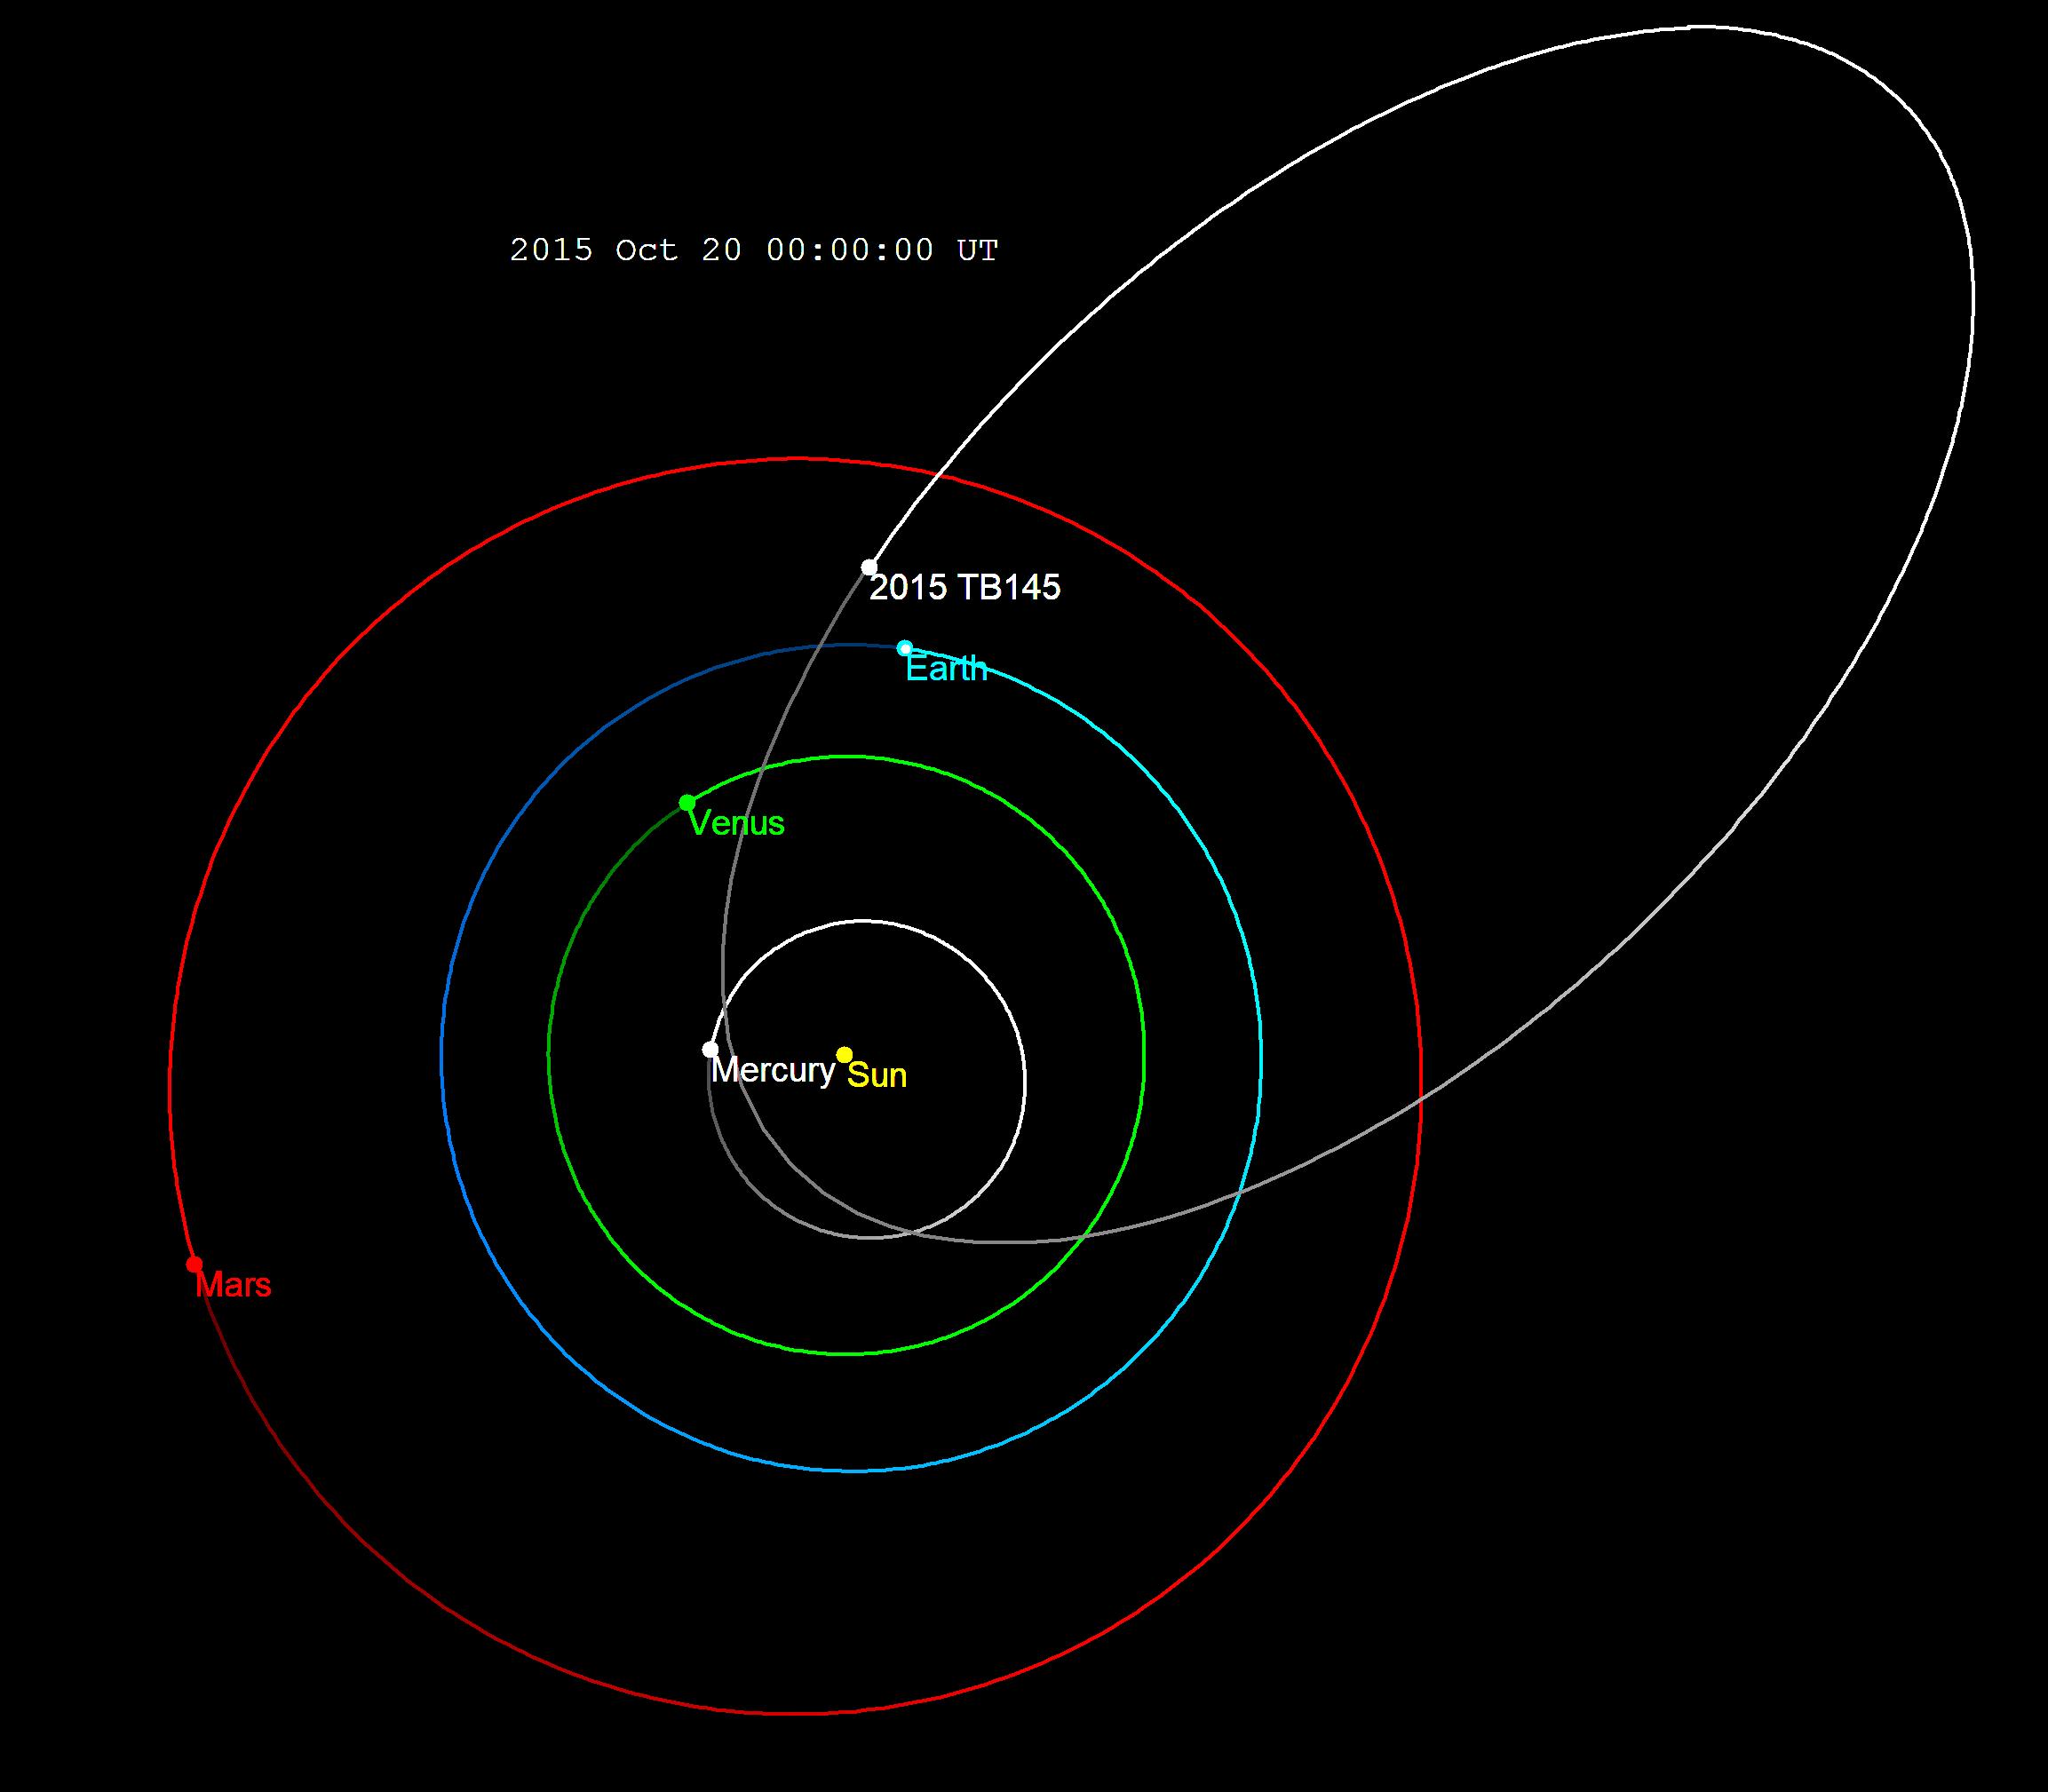 https://upload.wikimedia.org/wikipedia/commons/e/ed/2015_TB145_orbit_2015.png